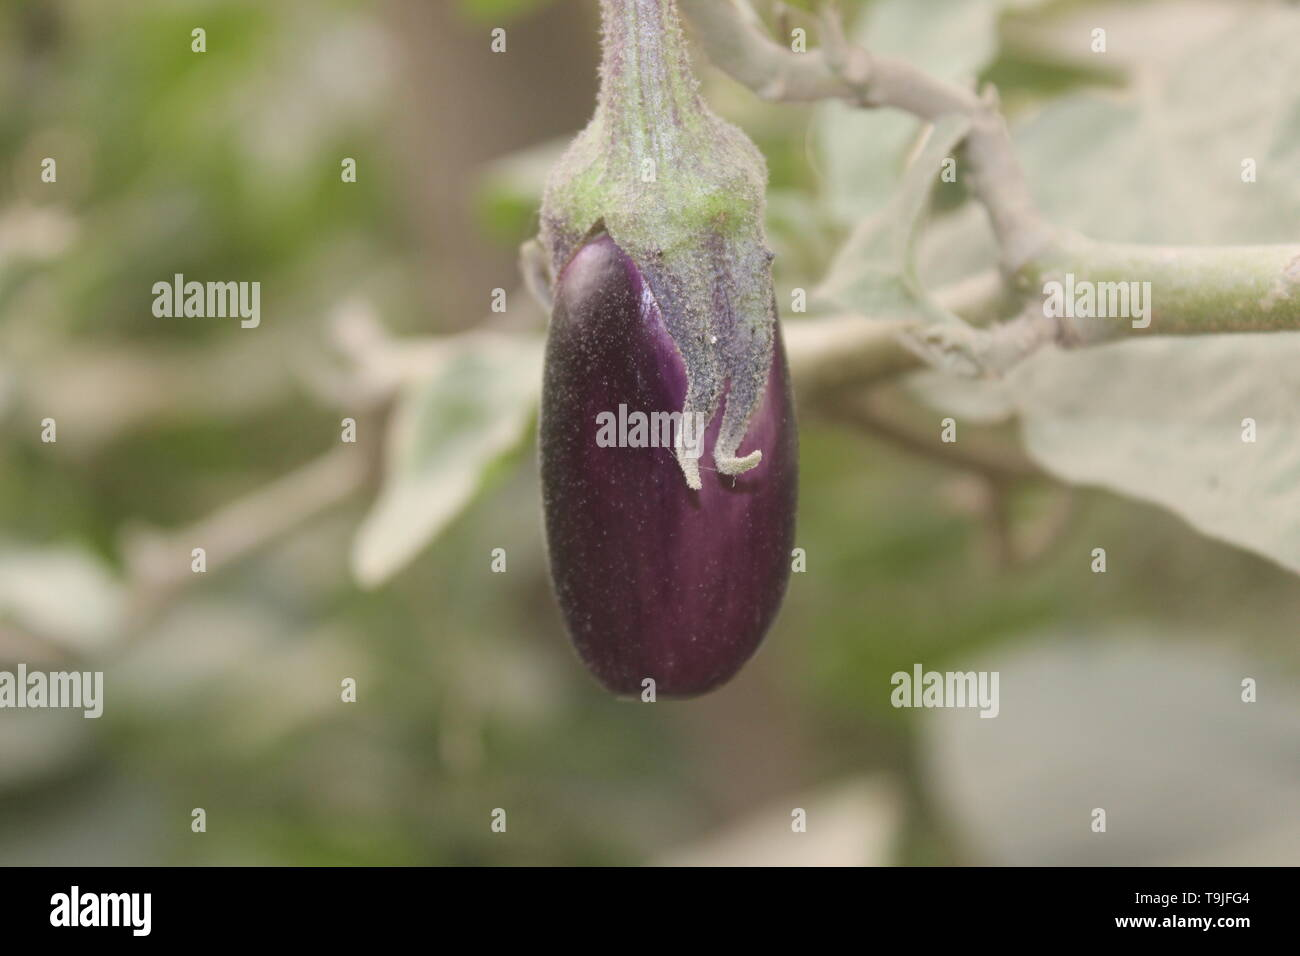 purple - Stock Image